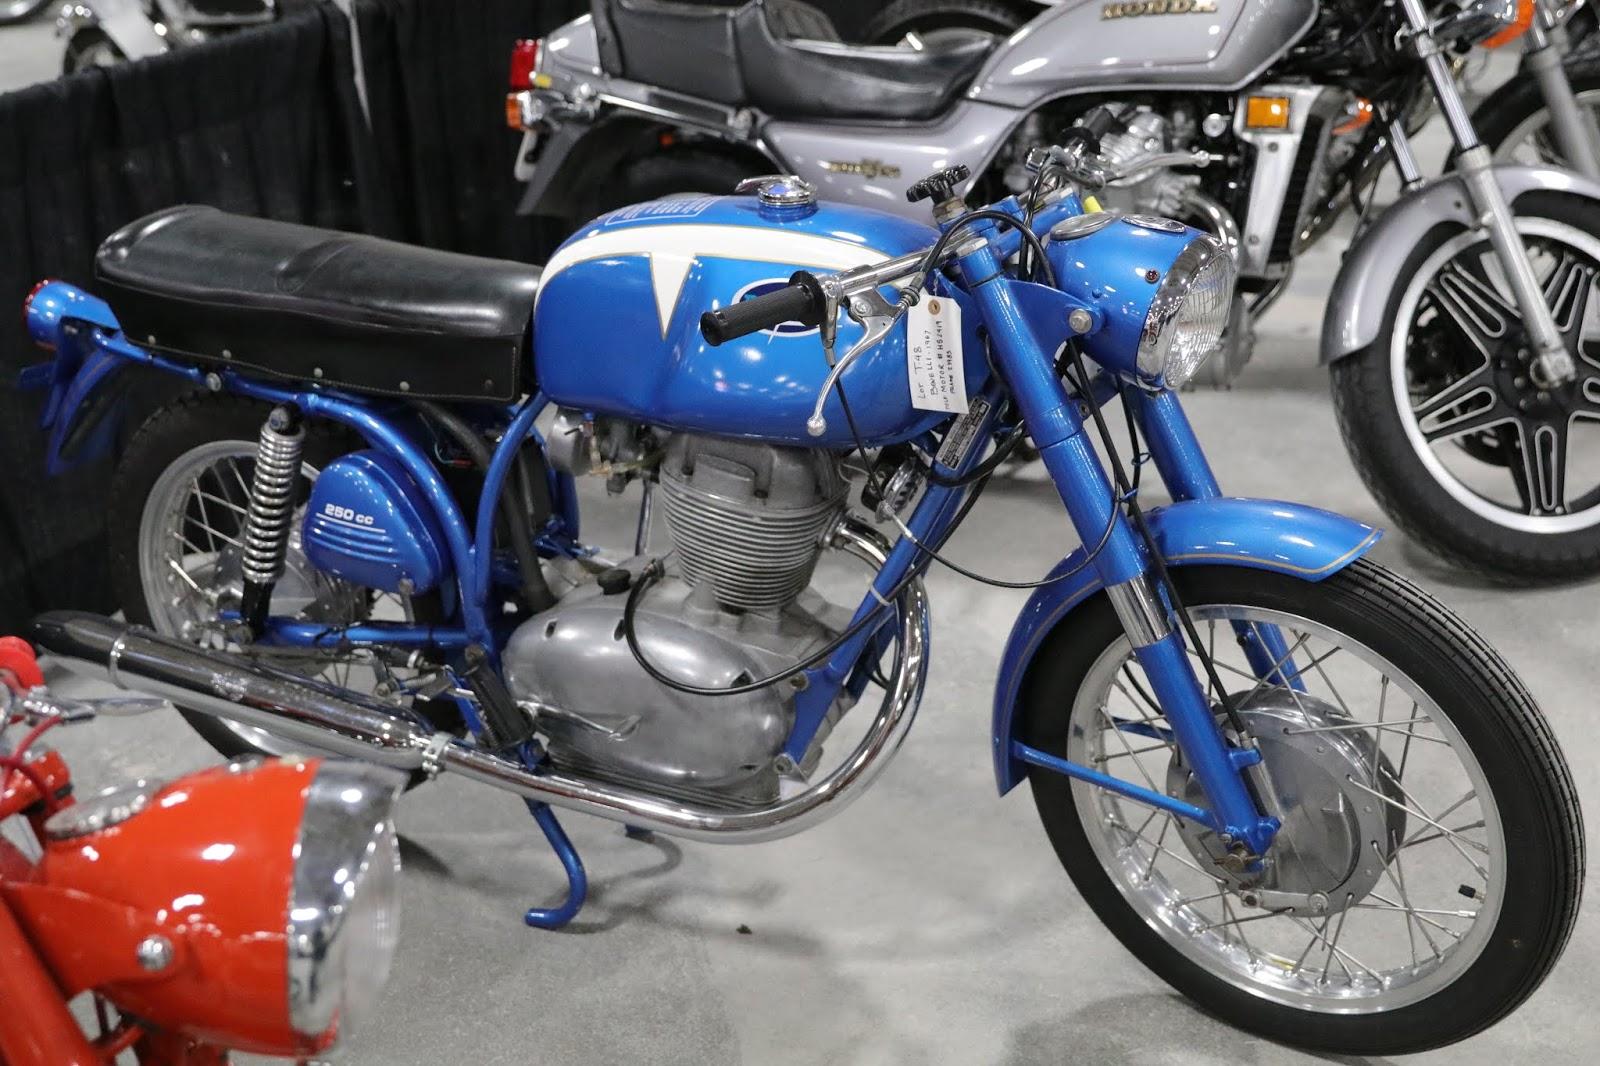 OldMotoDude: 1967 Wards/Benelli Riverside Sold For $2,200